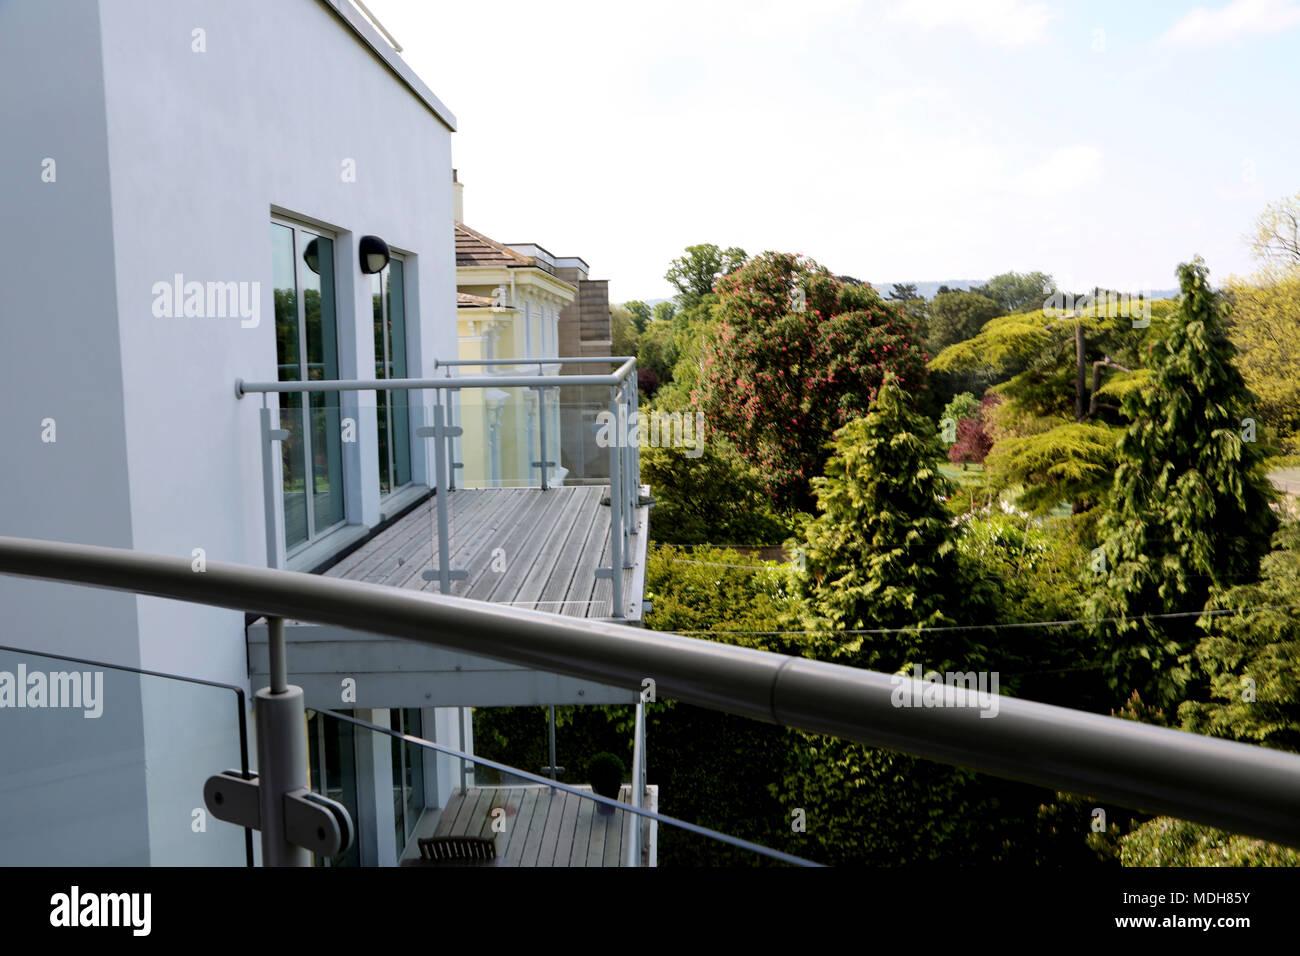 Balkon des Hauses Cheltenham Gloucestershire England Stockbild